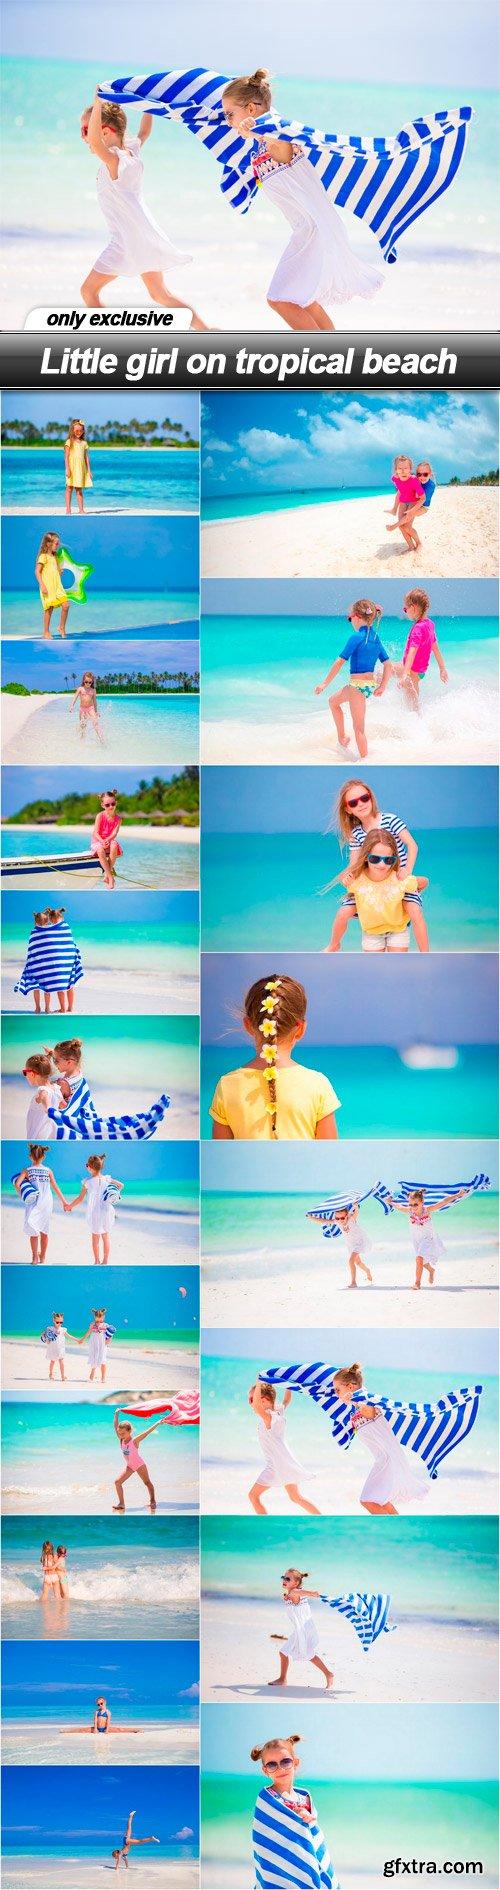 Little girl on tropical beach - 20 UHQ JPEG